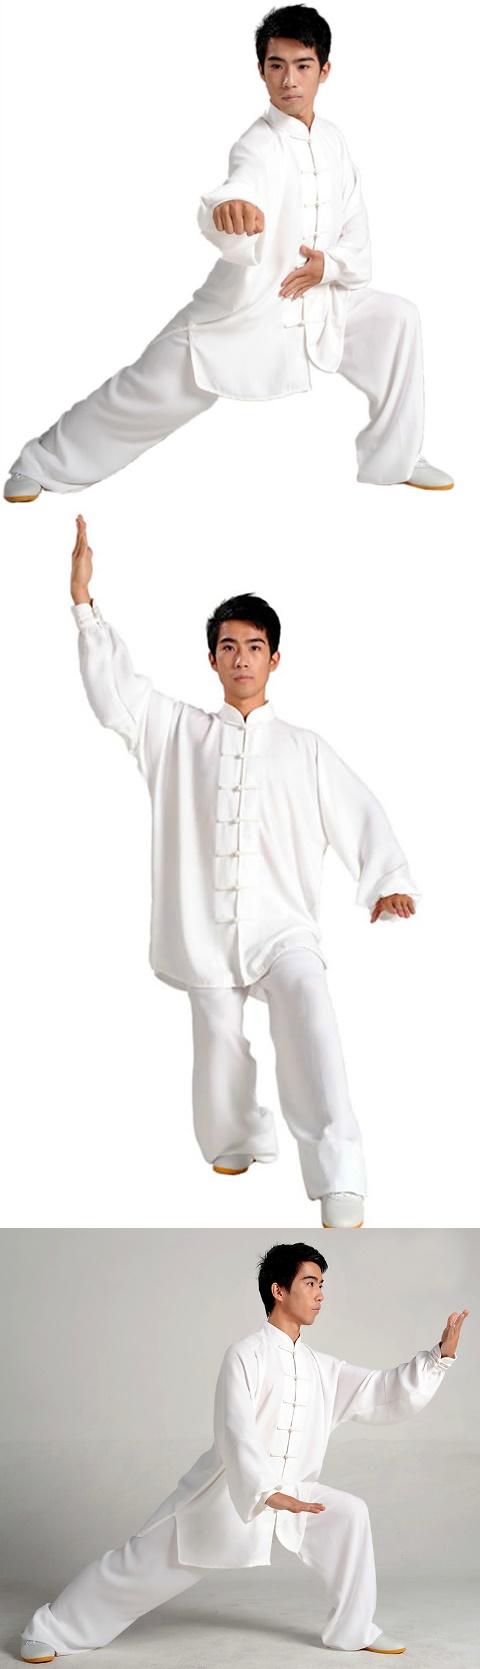 Professional Taichi Kungfu Uniform with Pants - Jiajia Cotton - White (RM)